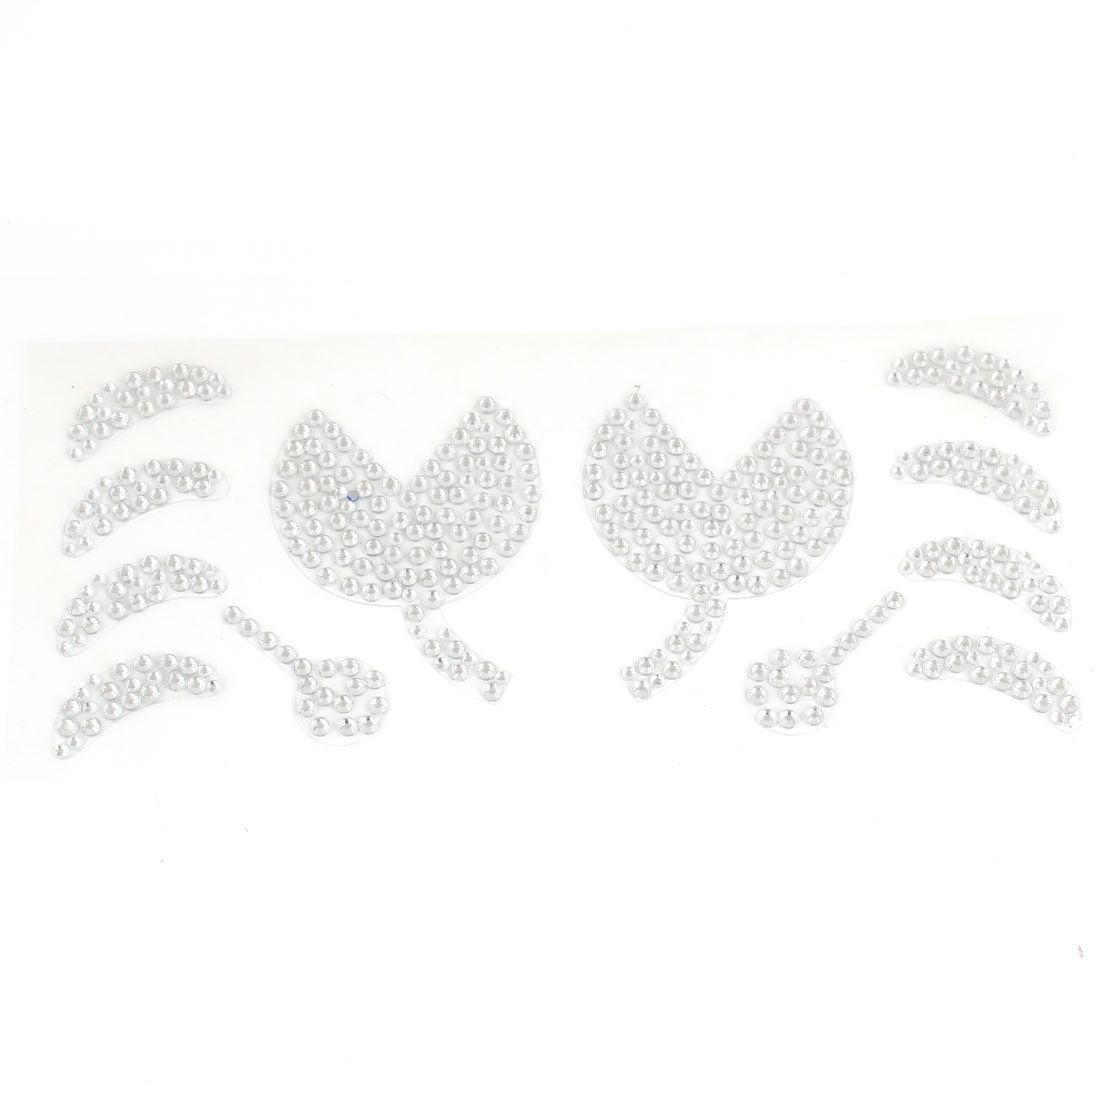 Unique Bargains Silver Tone Rhinestones Floral Leaf Pattern Vehicles Decal Sticker Decor 12 in 1